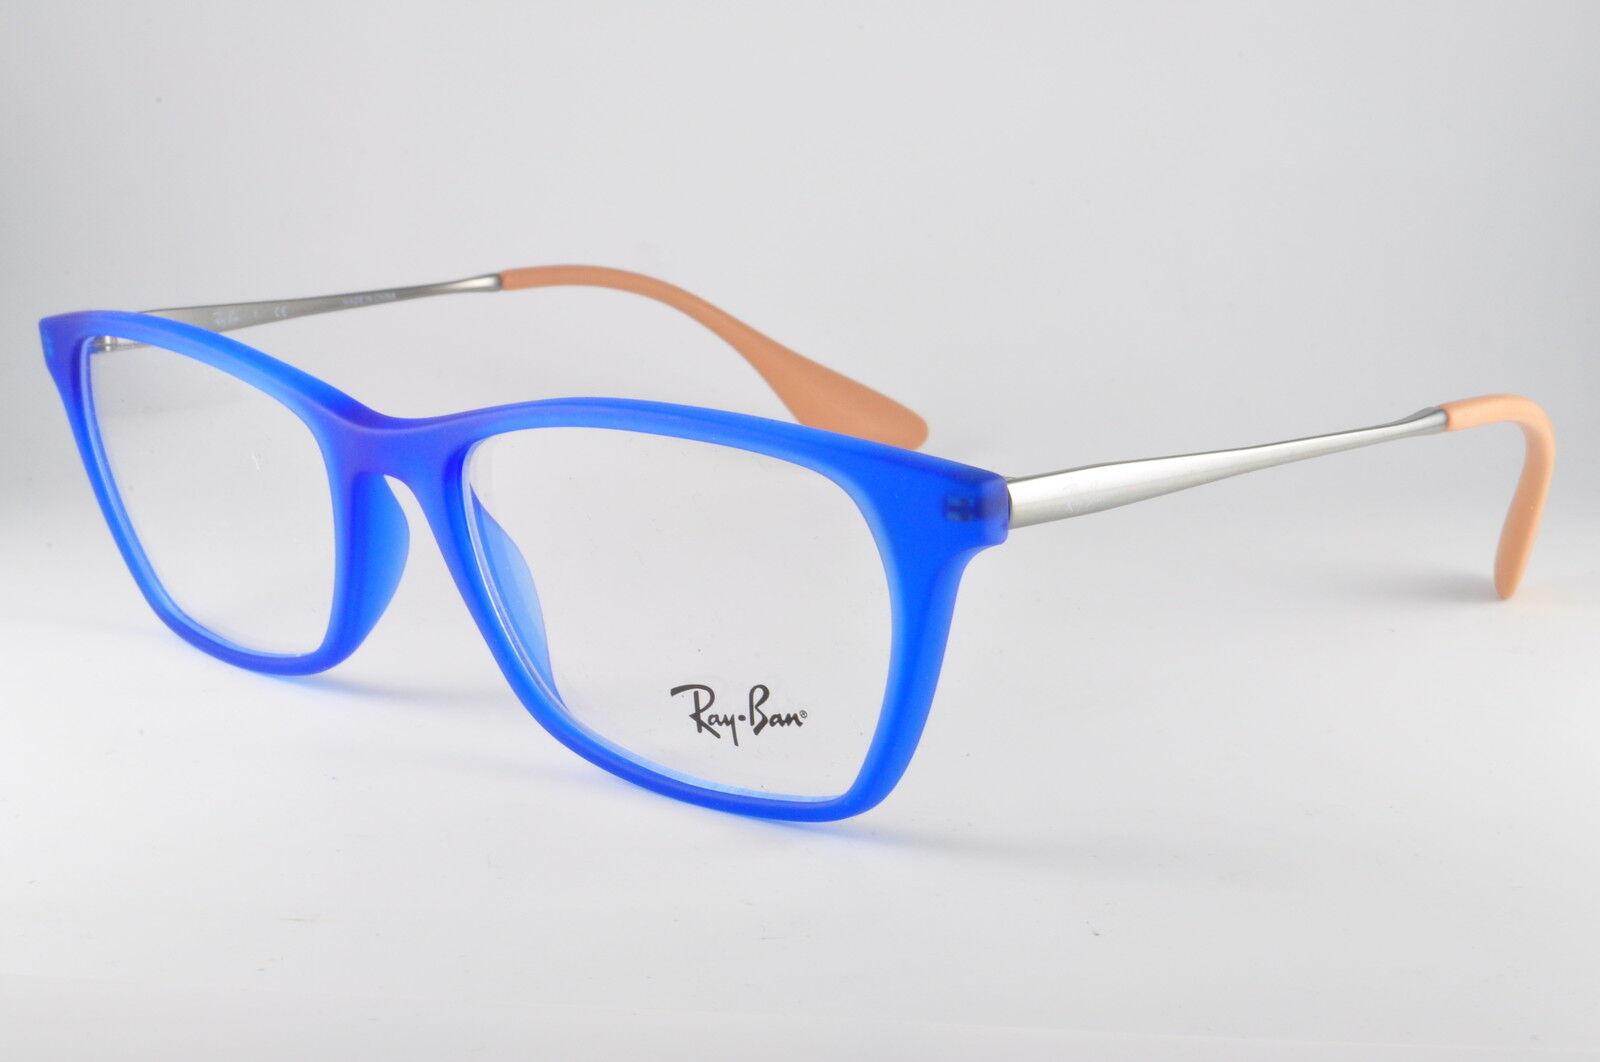 Authentic Ray Ban Eyeglasses Frames Rx7053 5524   eBay